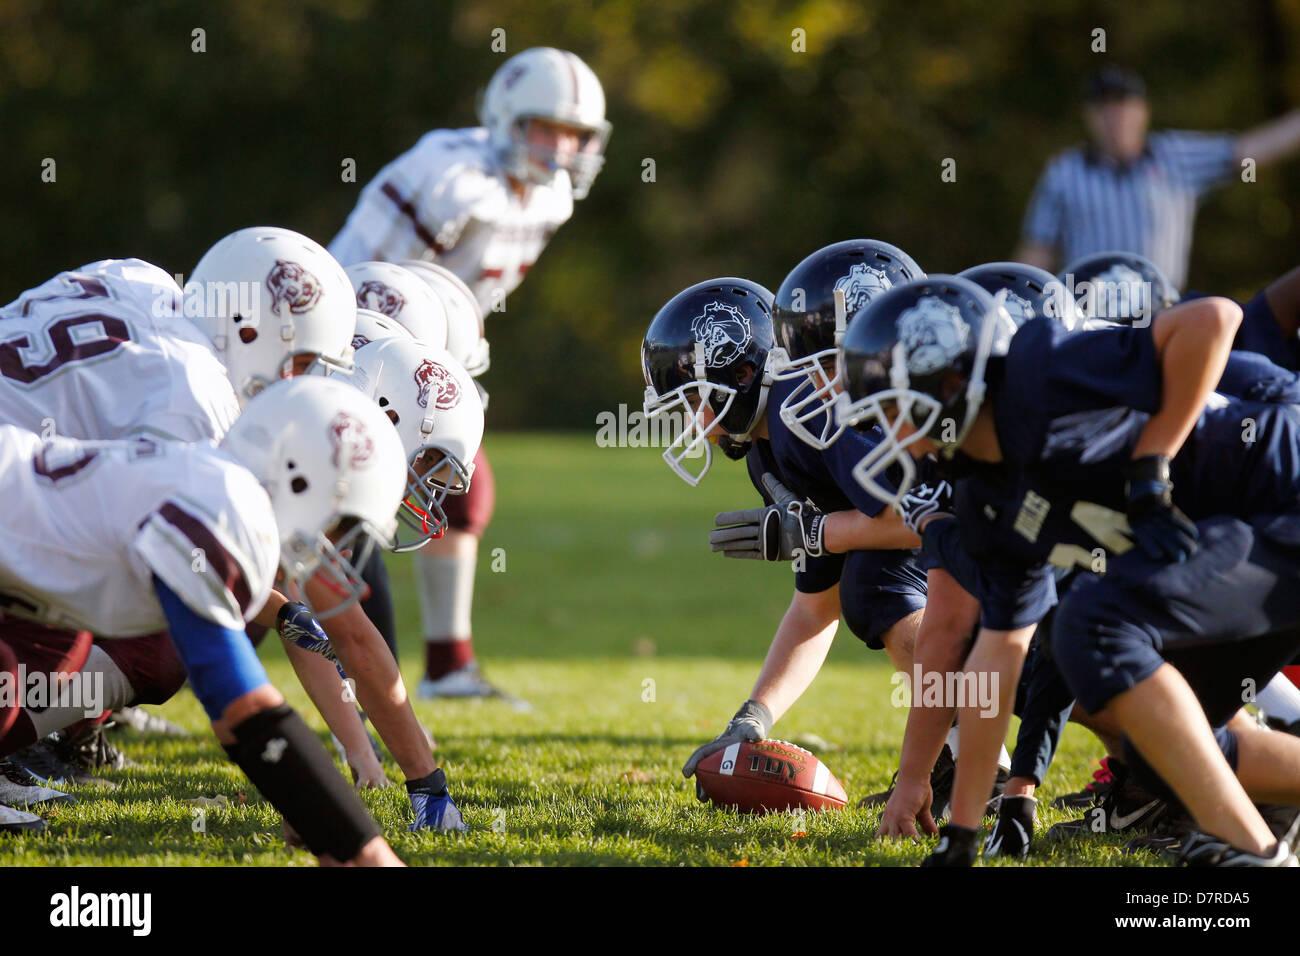 High school football game - Stock Image